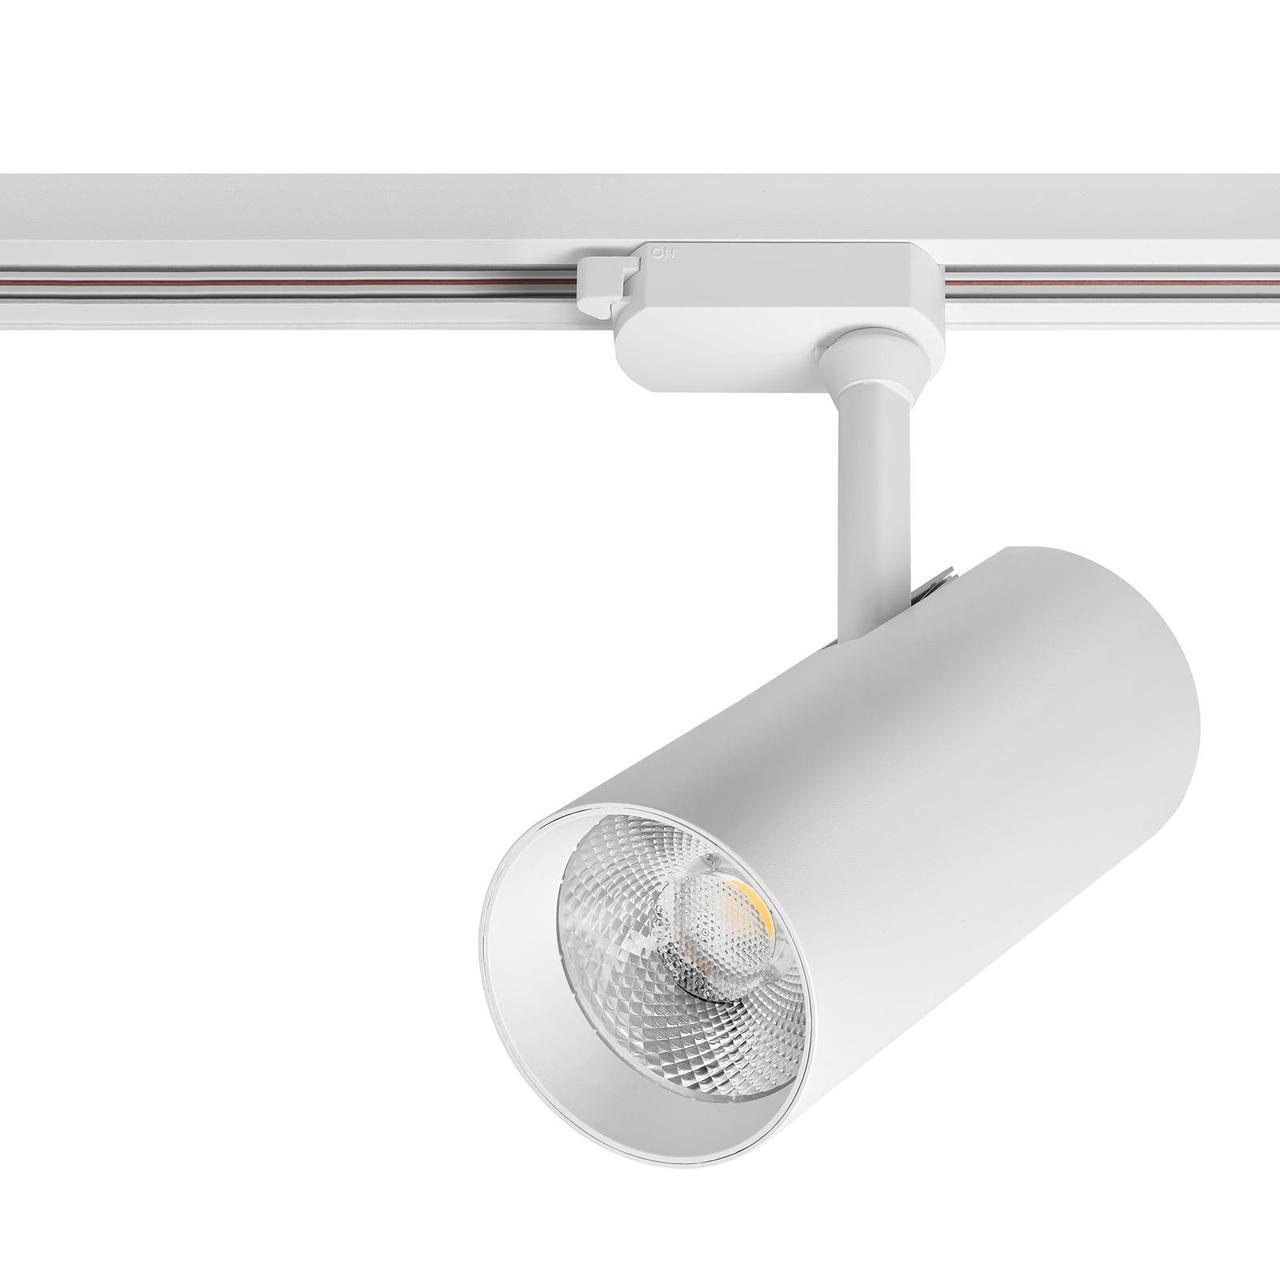 Лед прожектор трековый DELUX TL04 30 Вт  24°  4000K  белый